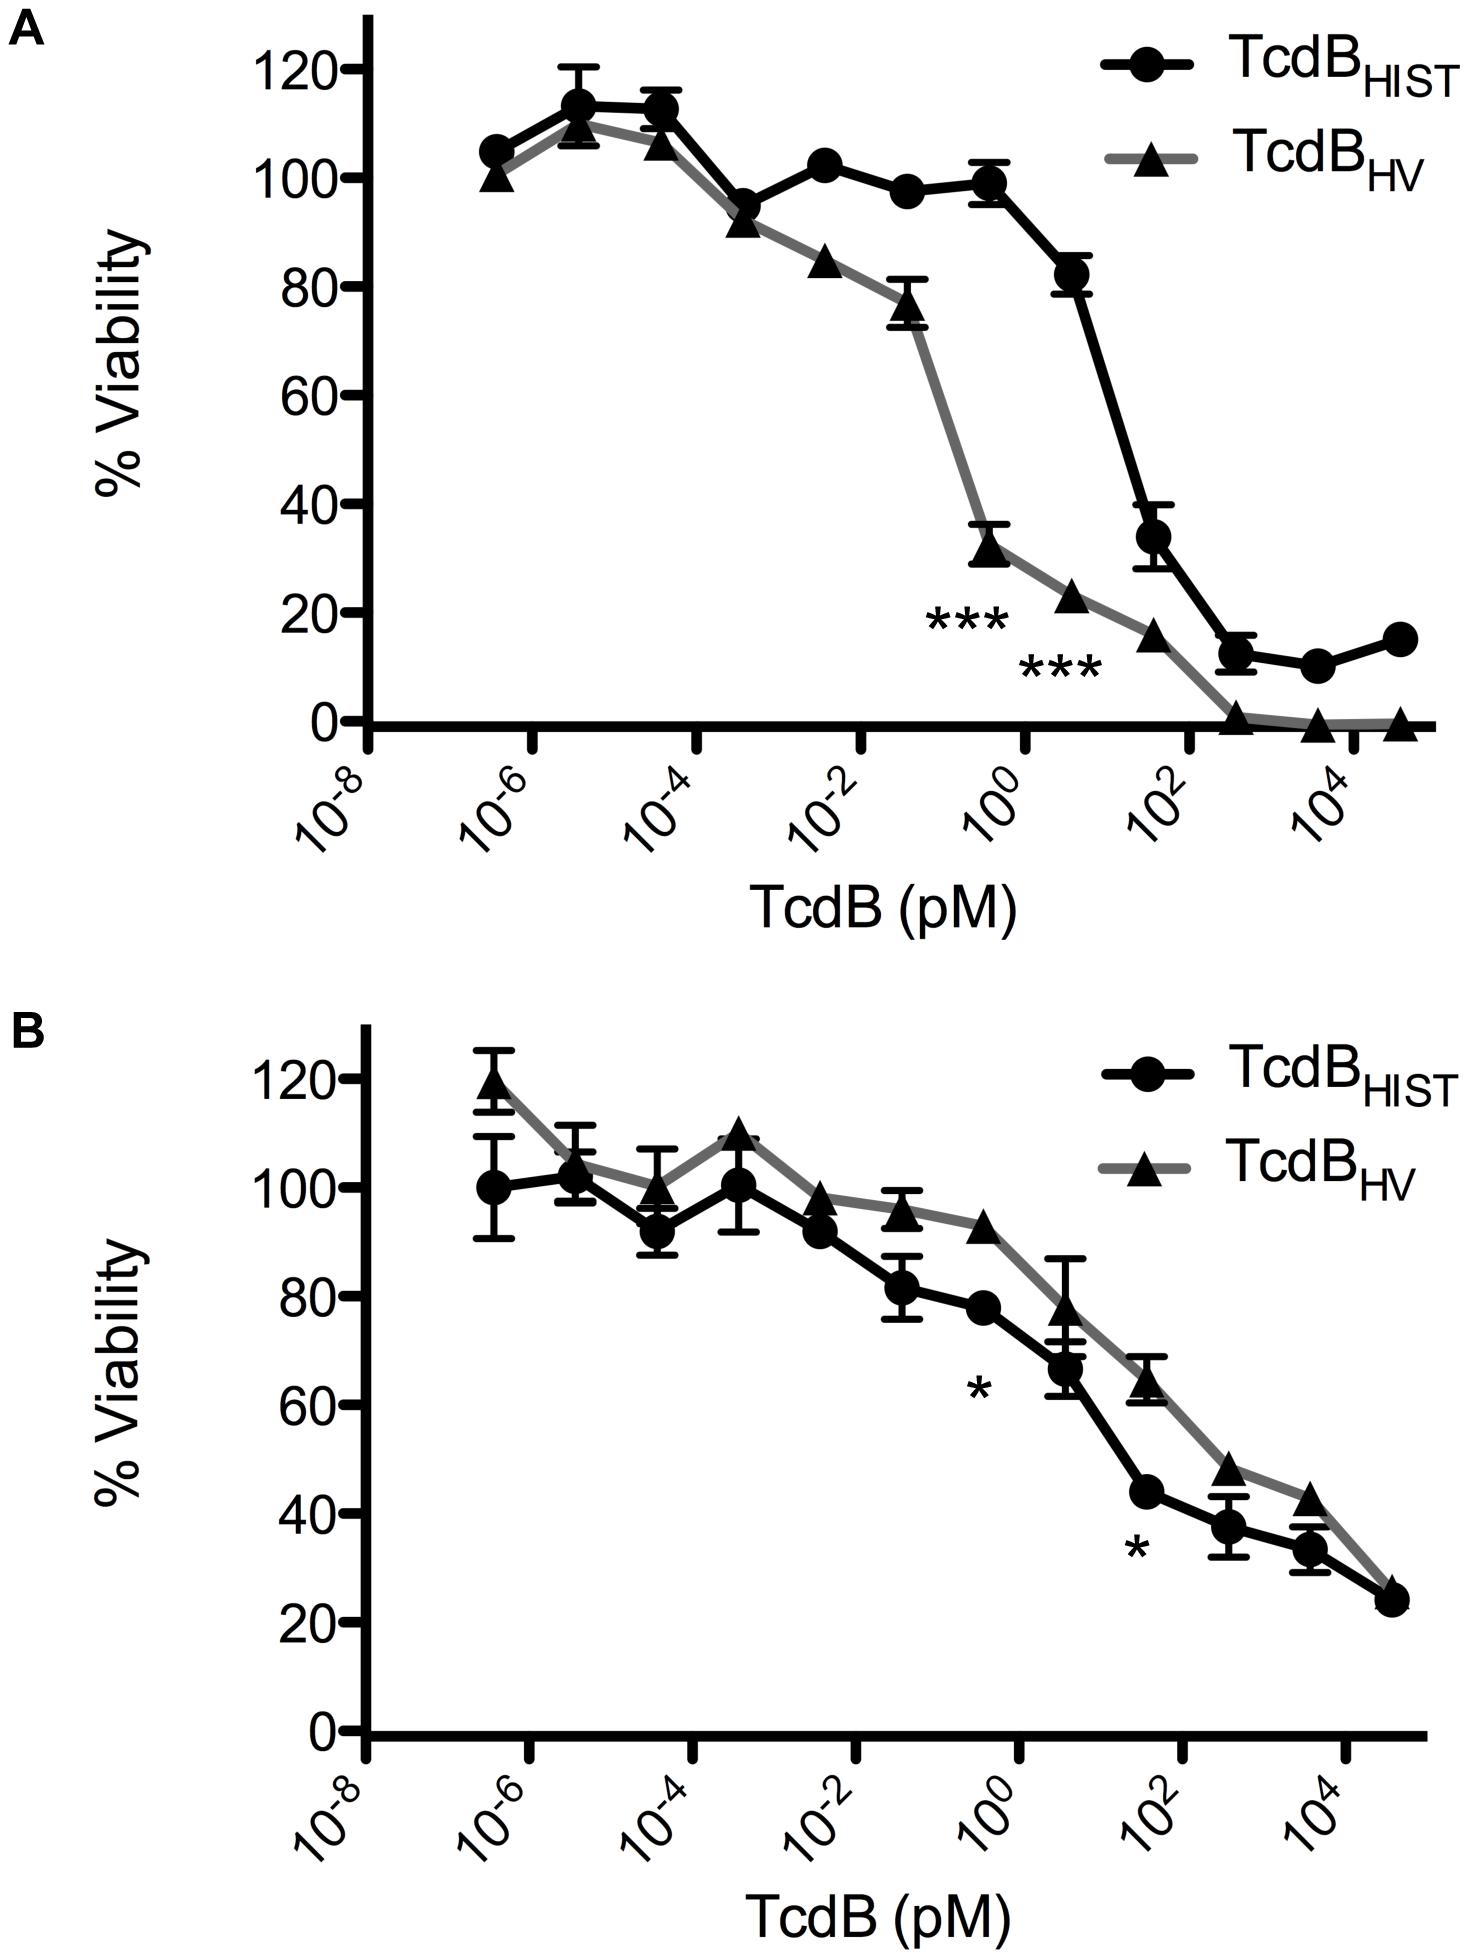 Comparative dose response of TcdB<sub>HIST</sub> and TcdB<sub>HV</sub>.